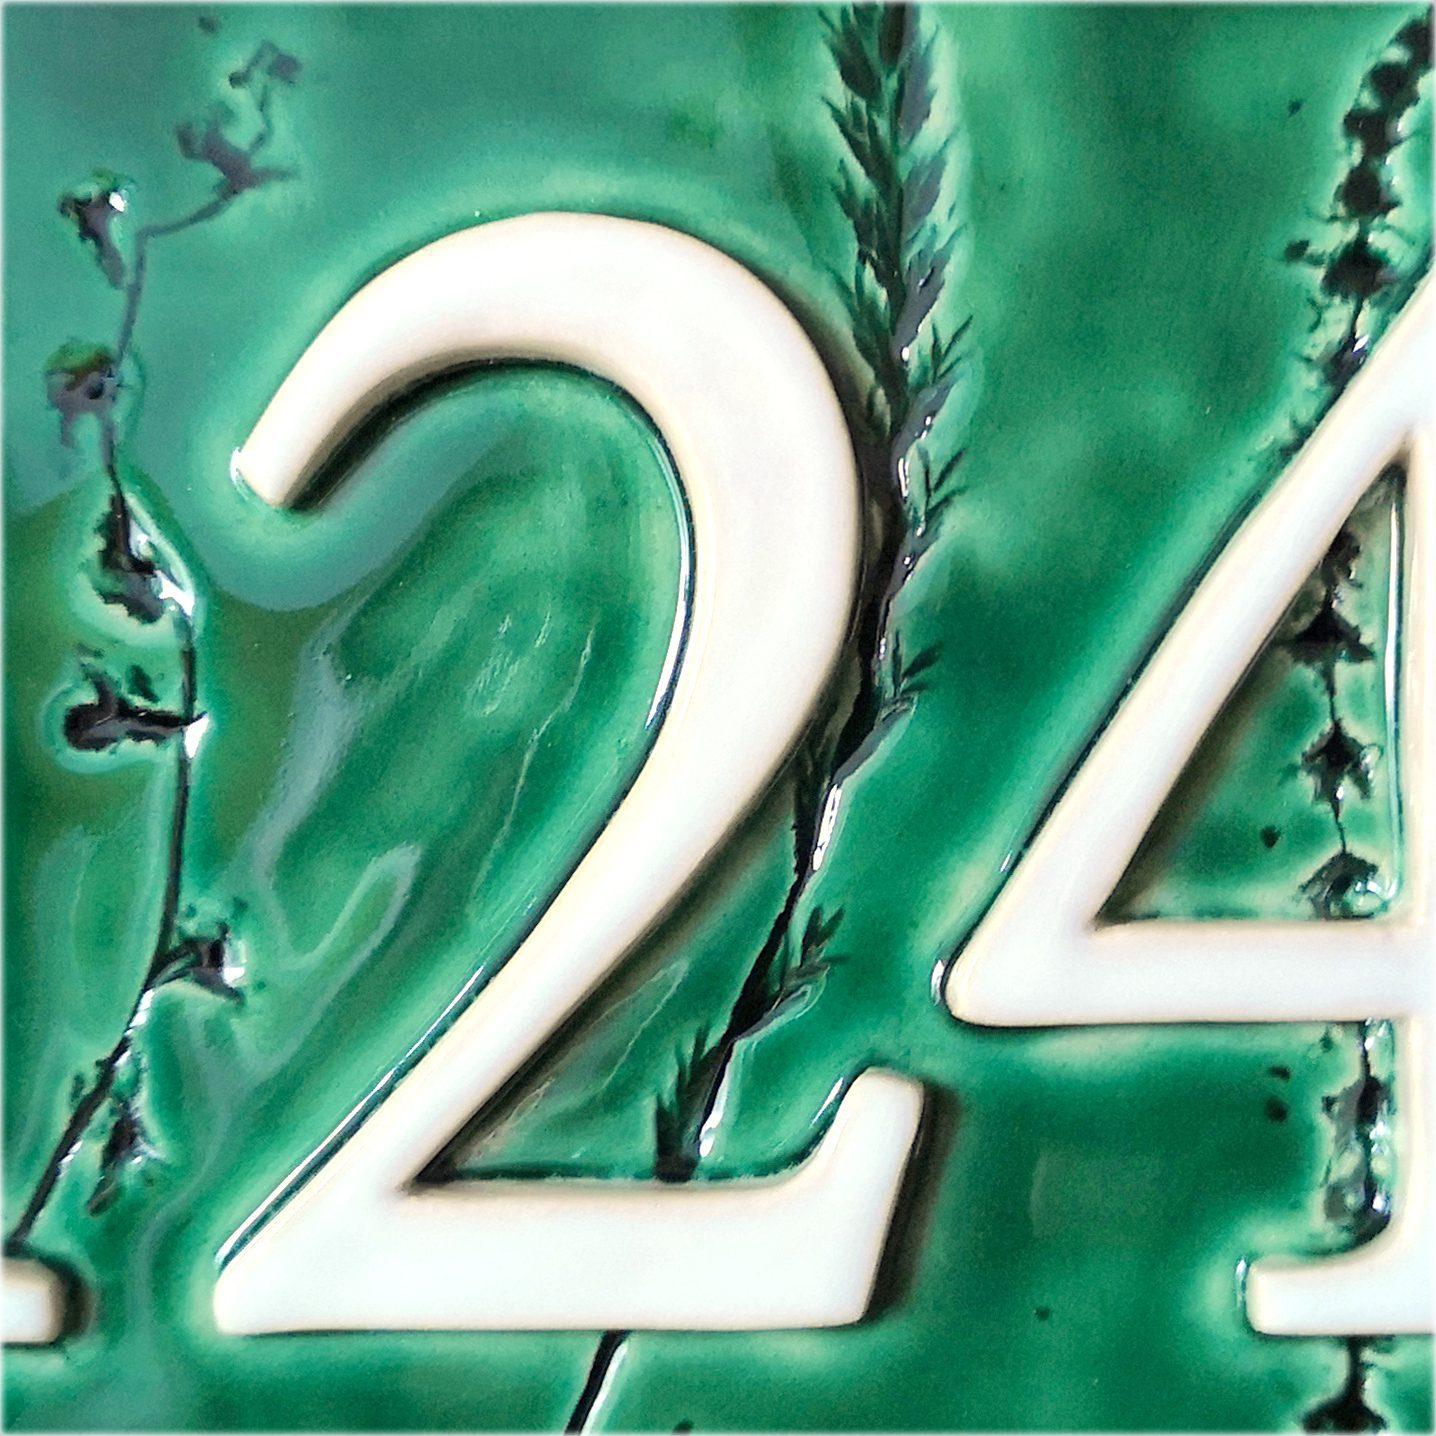 Detail groen huisnummerbord met plantjes.